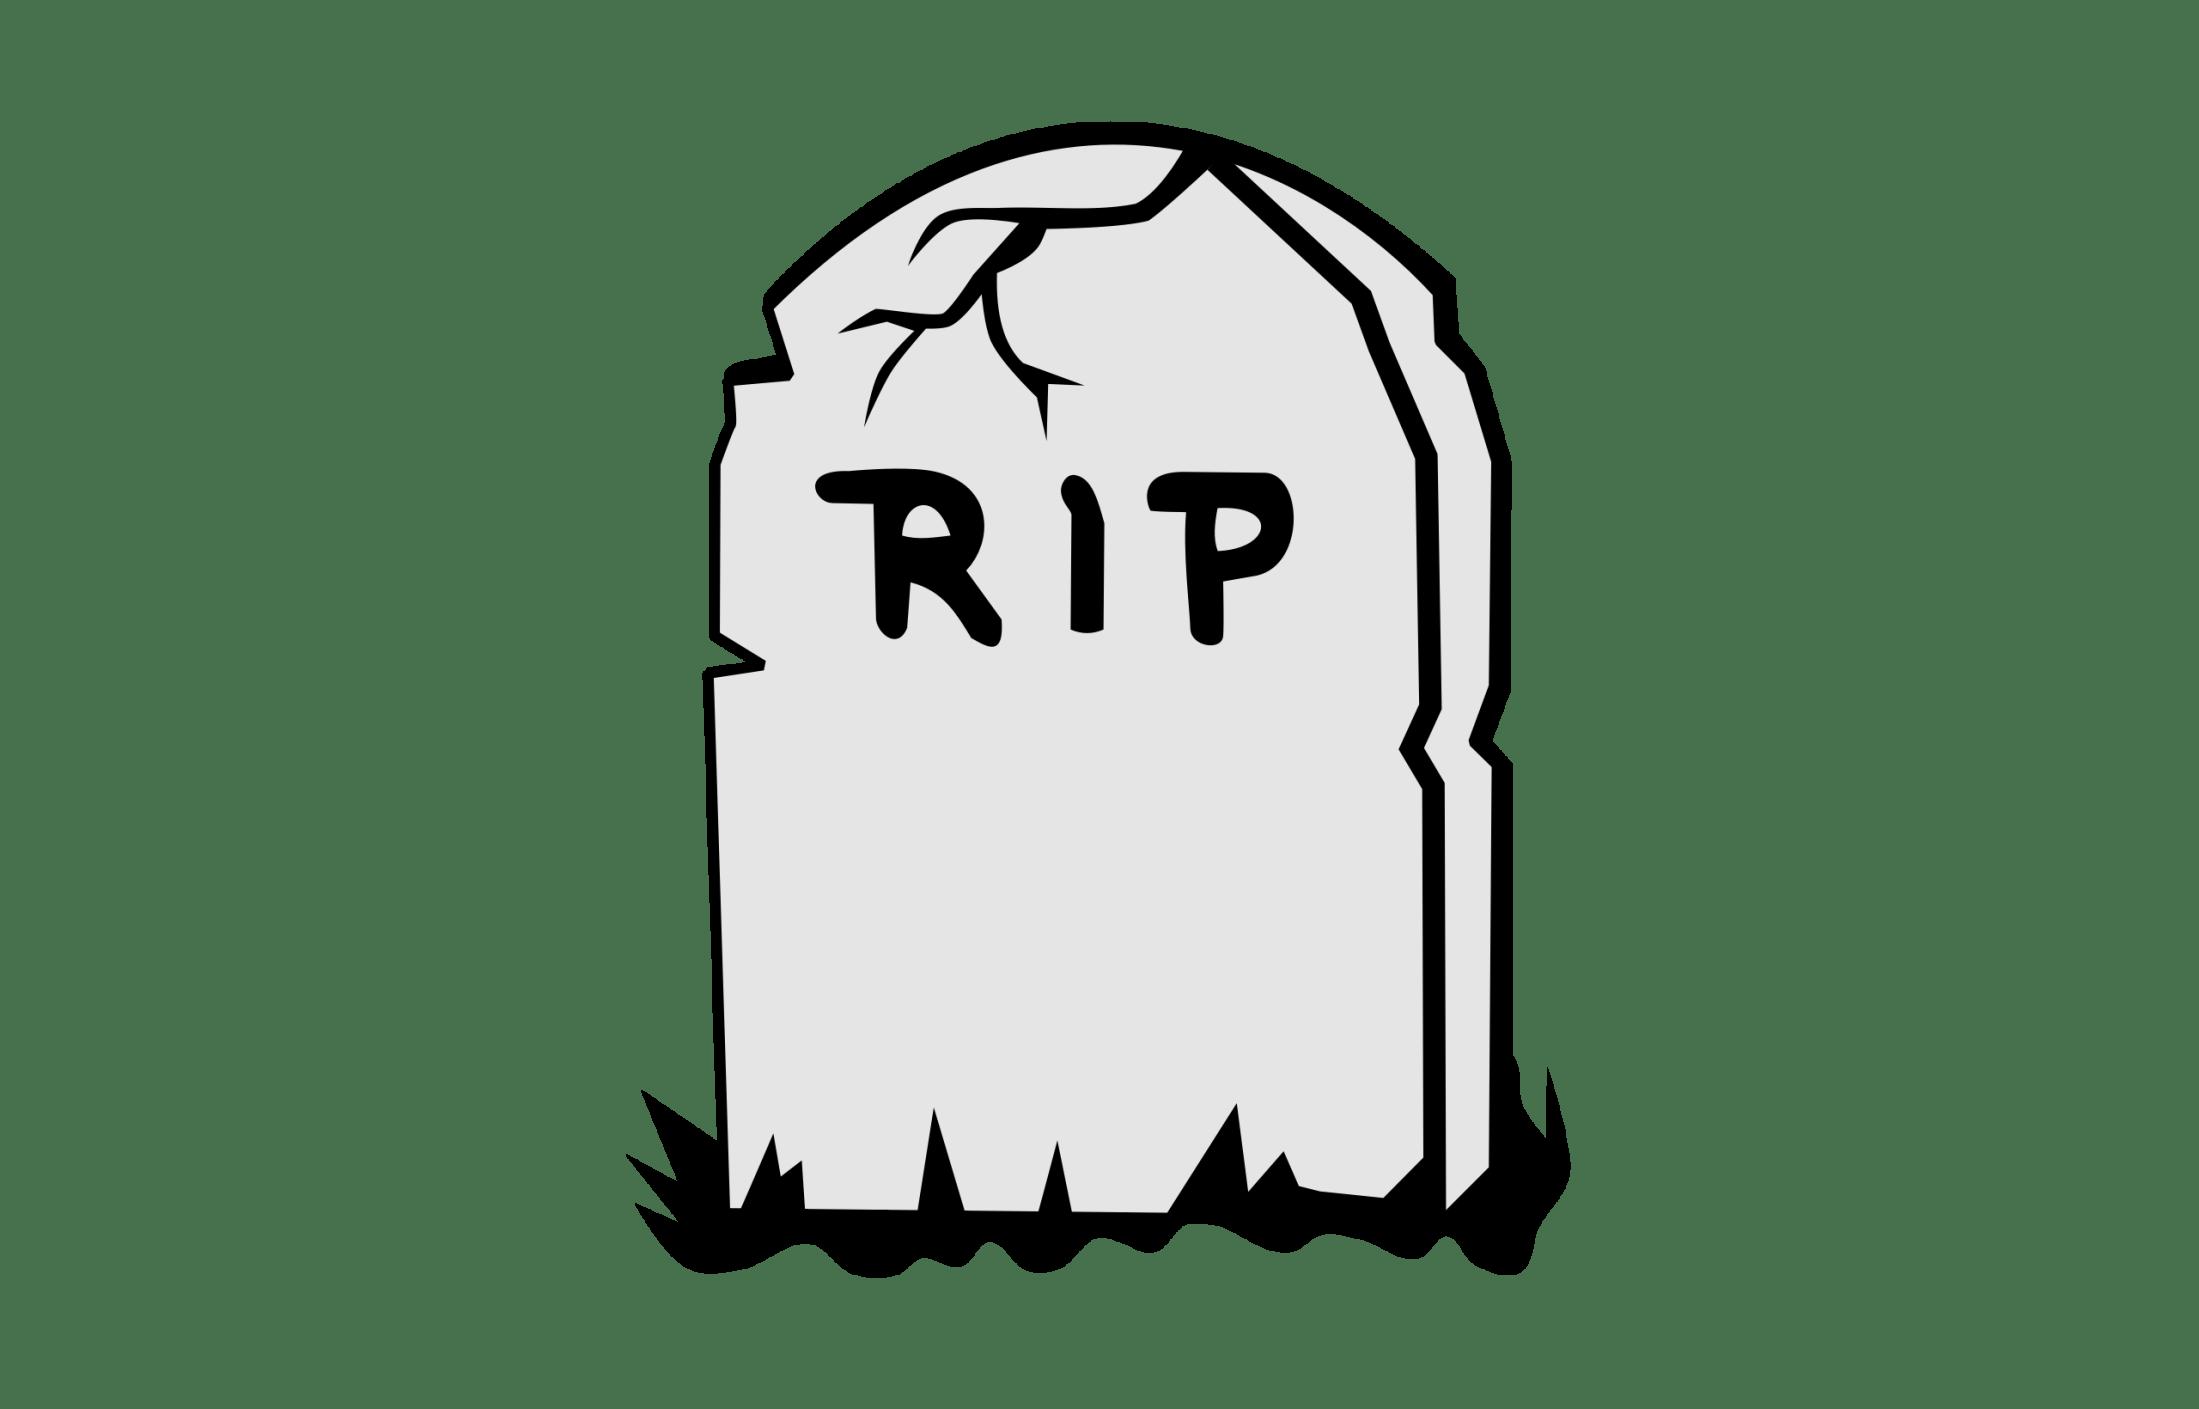 Microsoft closes the Office.com Clip Art Library RIP Grave